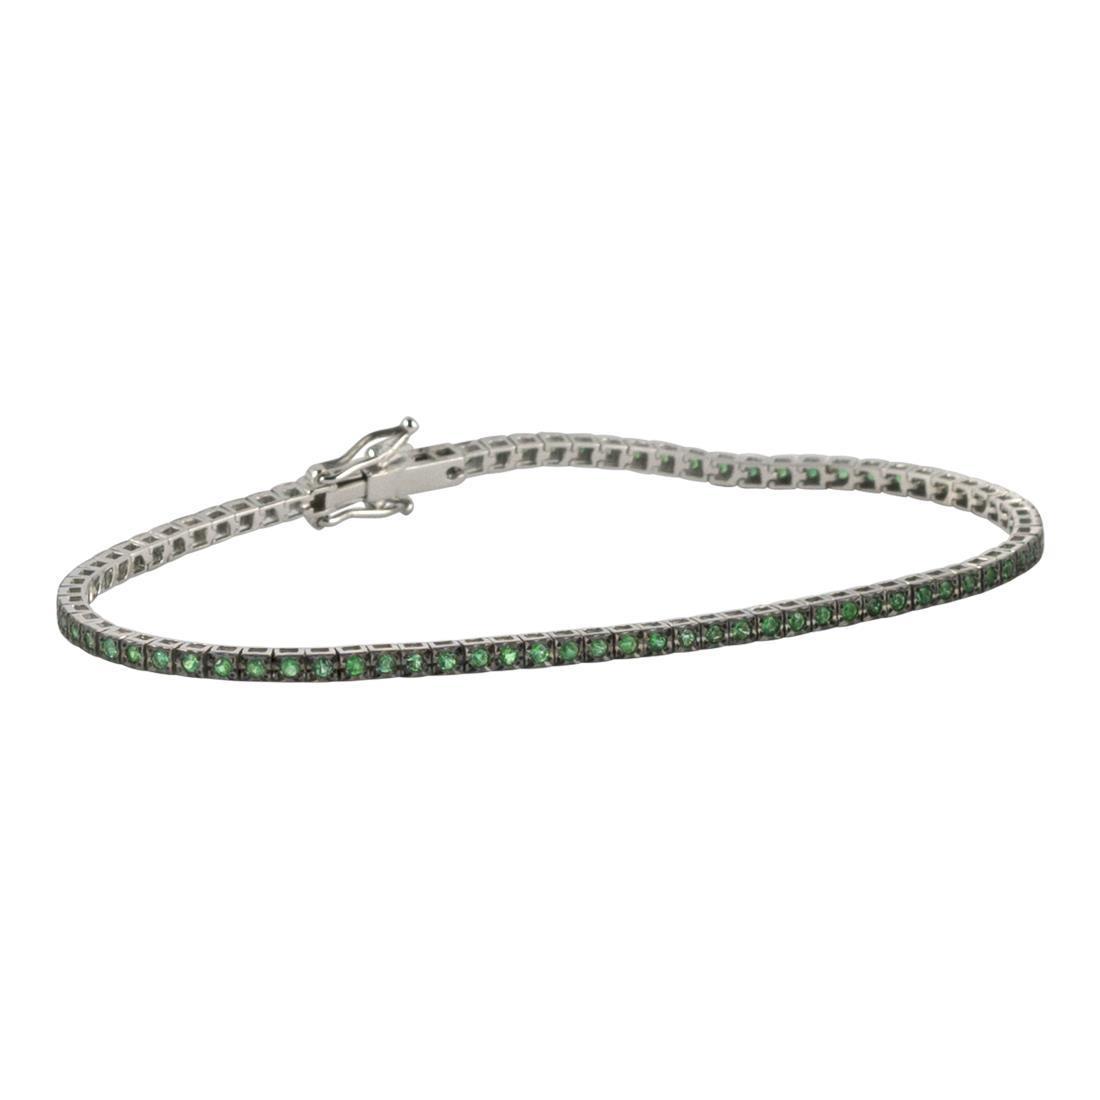 Bracciale tennis con smeraldi - ALFIERI & ST. JOHN